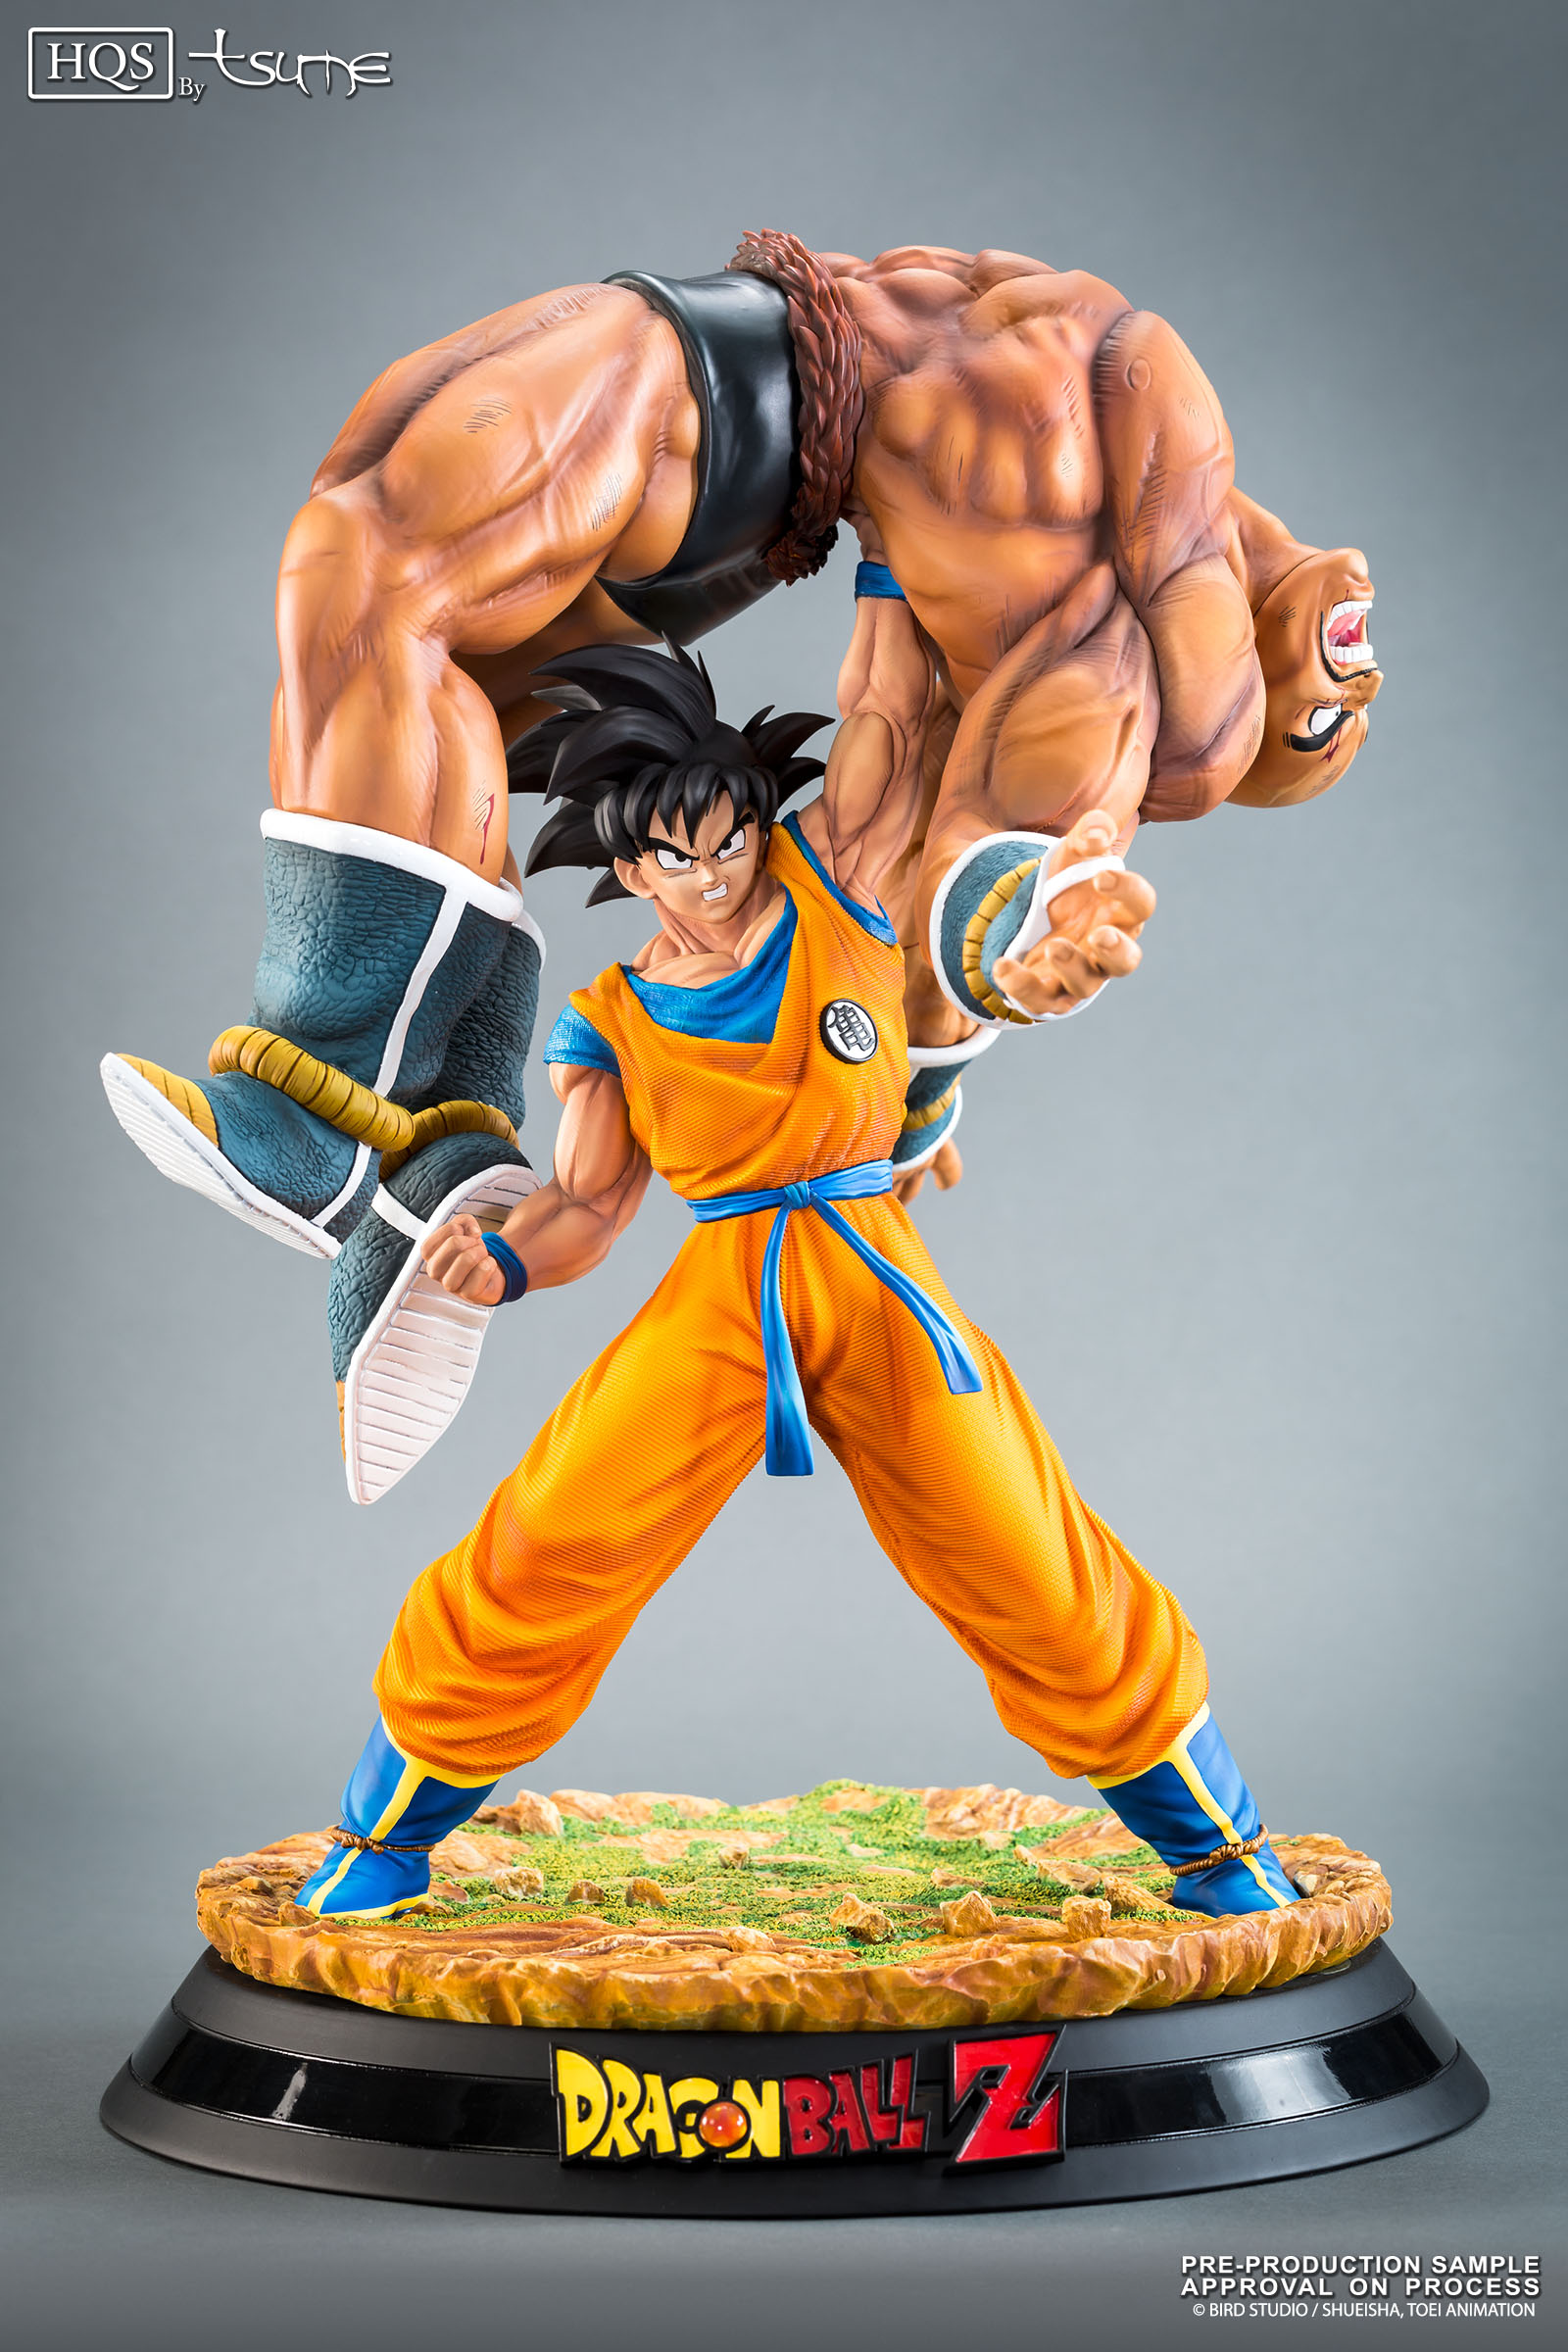 Tsume Art Dragonball Z The Quiet Wrath Of Son Goku HQS